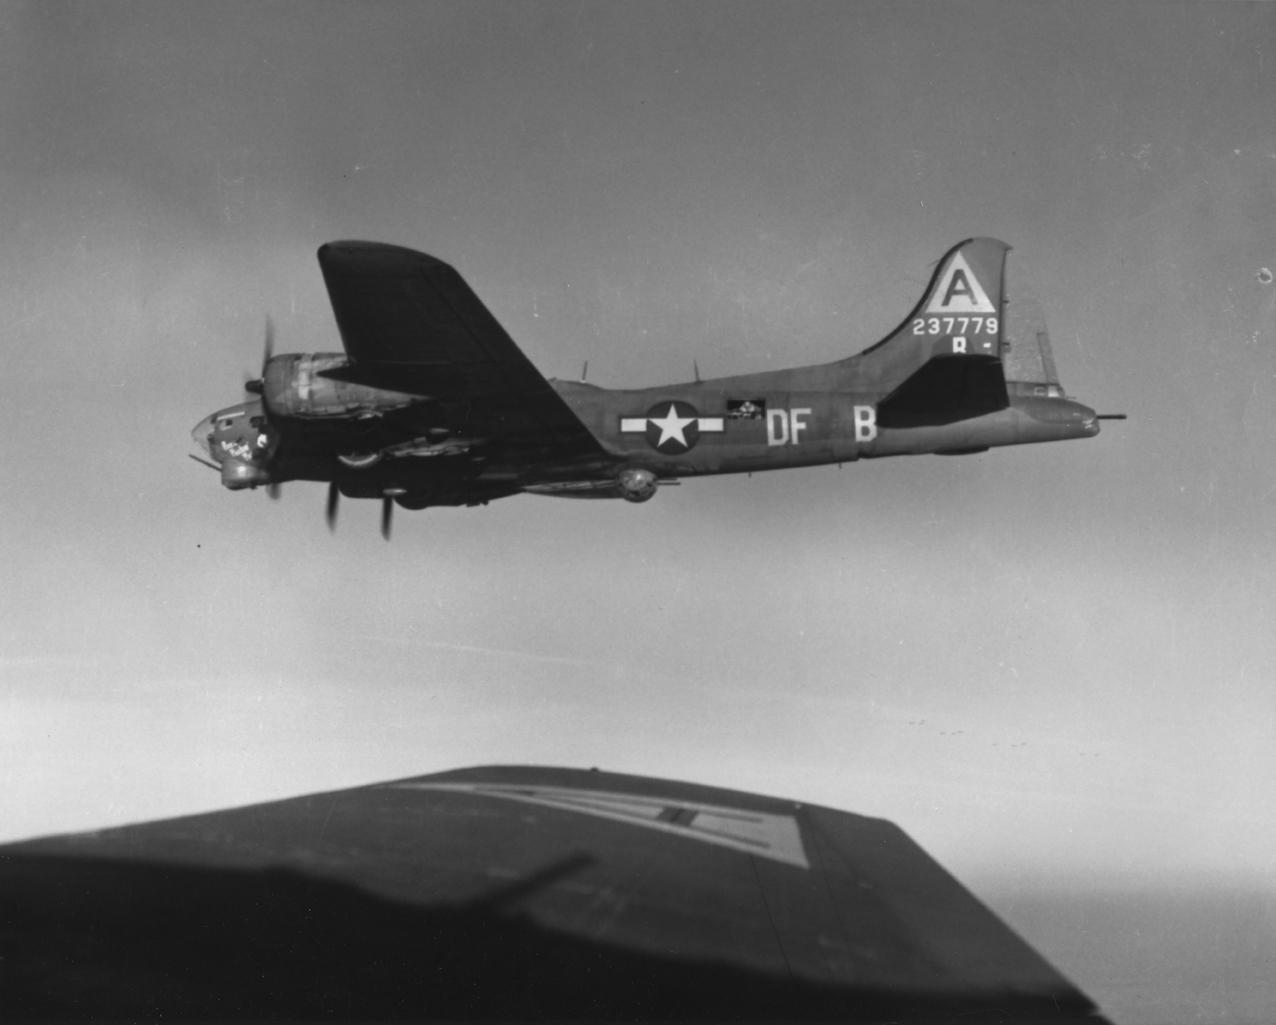 B-17 #42-37779 / Pistol Packin' Mama